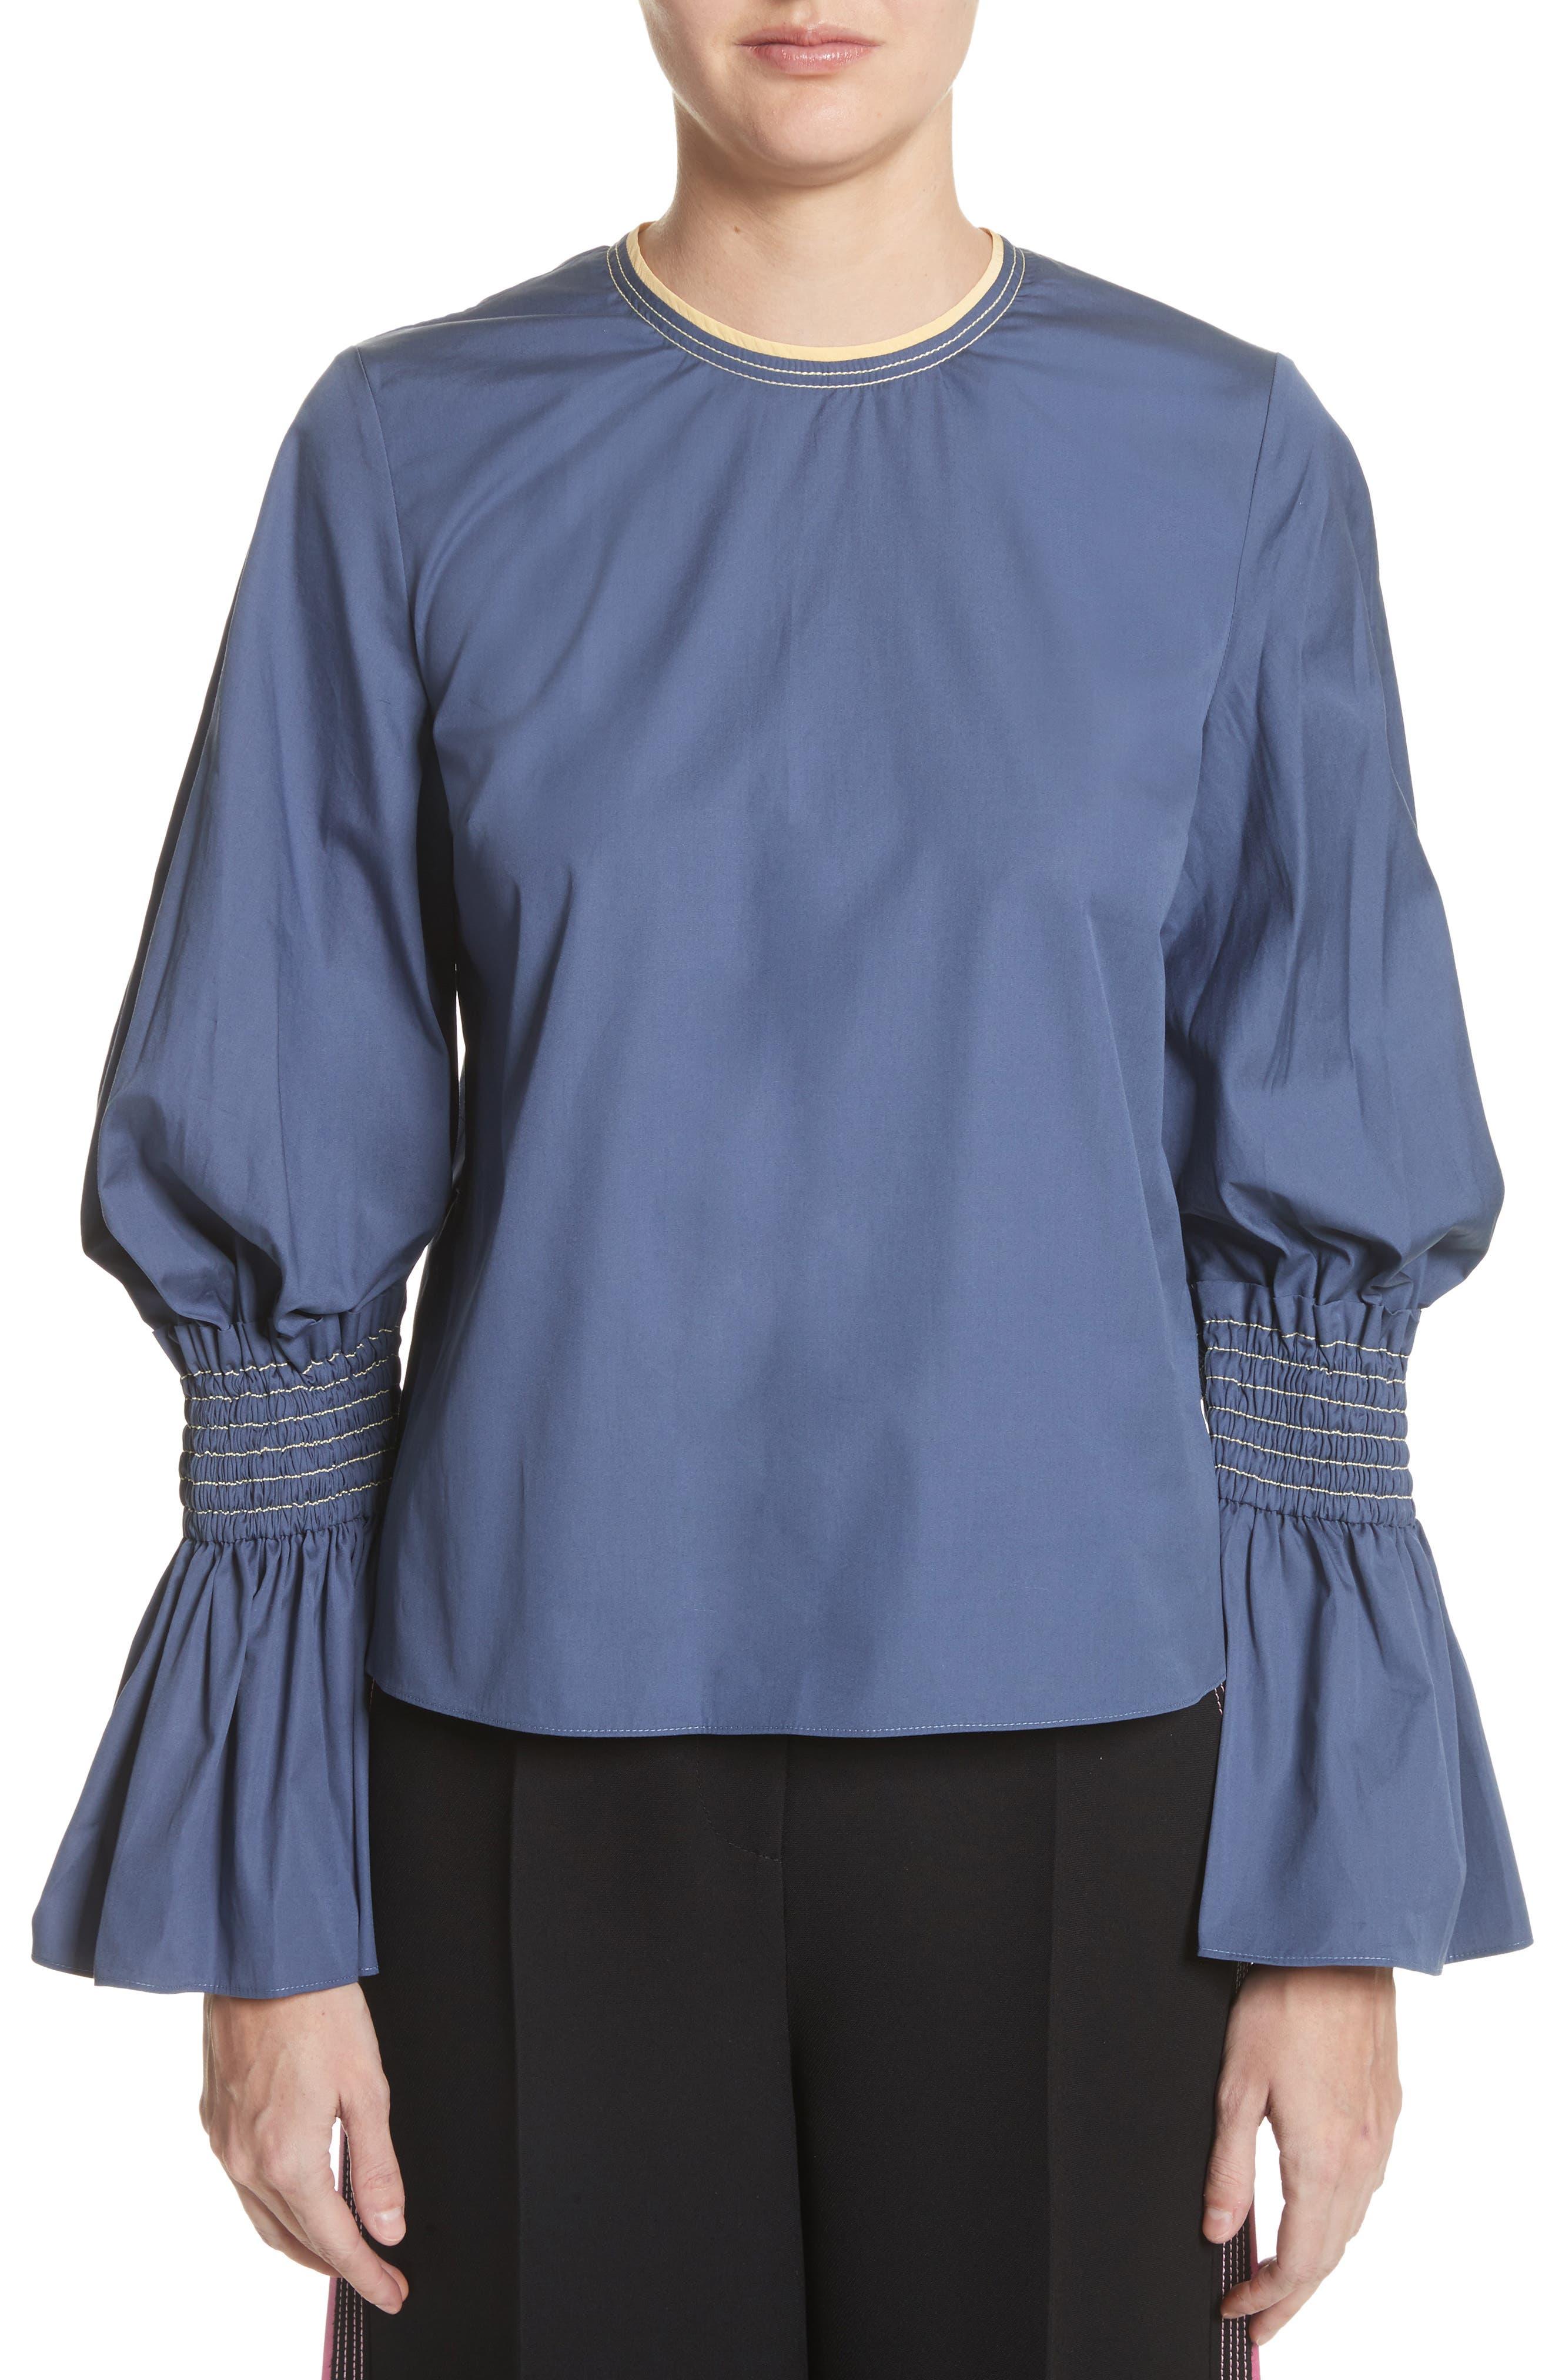 Kalila Top,                             Main thumbnail 1, color,                             French Blue / Sorbet